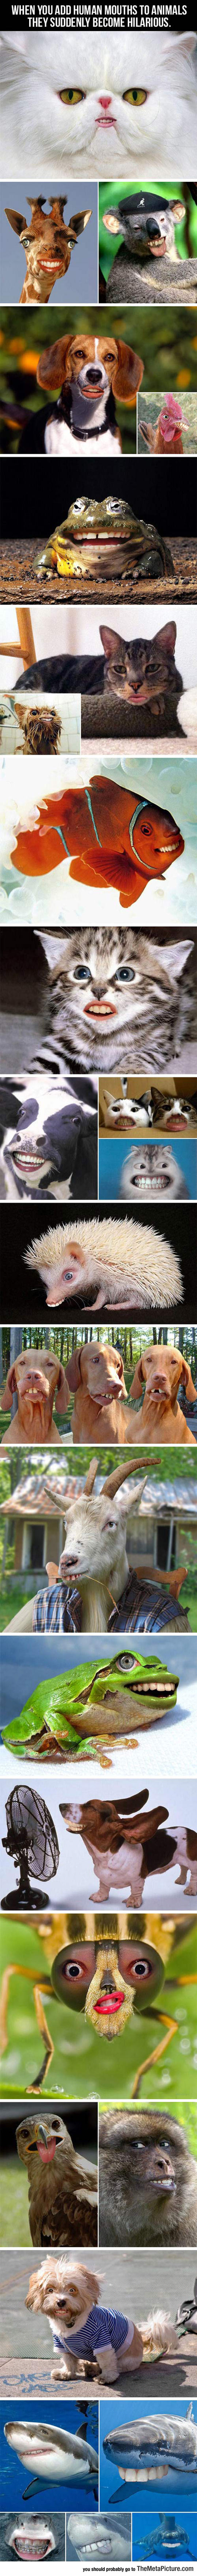 cool-animals-human-mouths-teeth